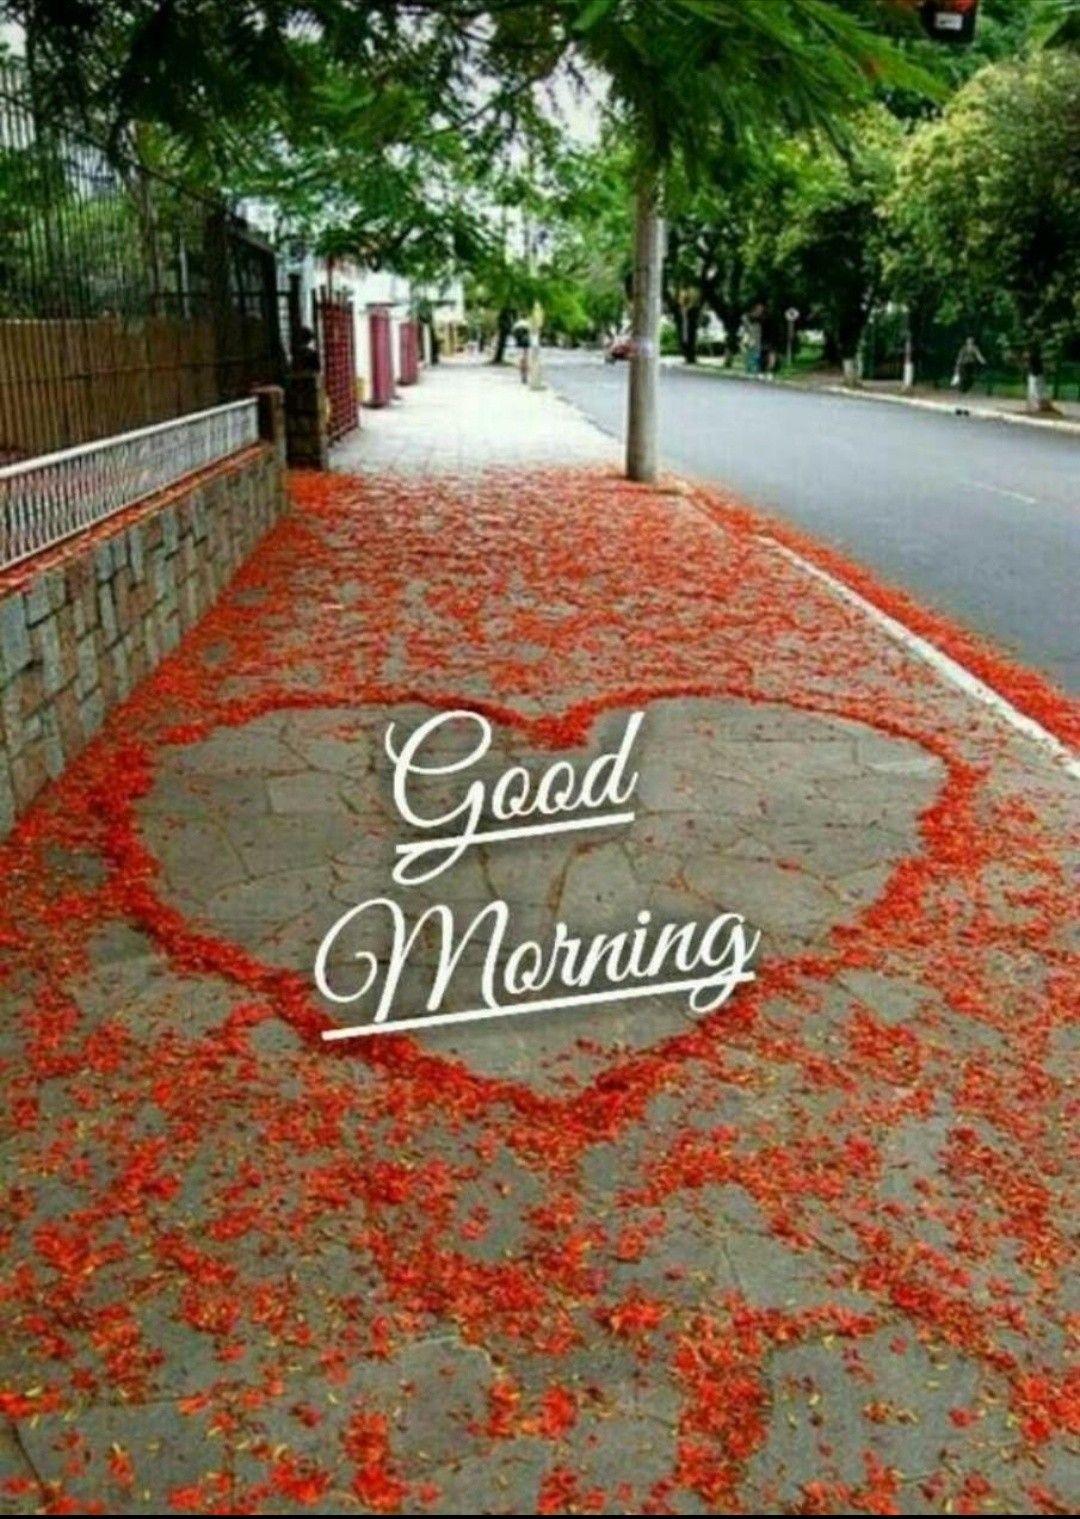 Pin By Meenu Gilhotra On Good Morning Heart In Nature Heart Shaped Rocks Heart Art